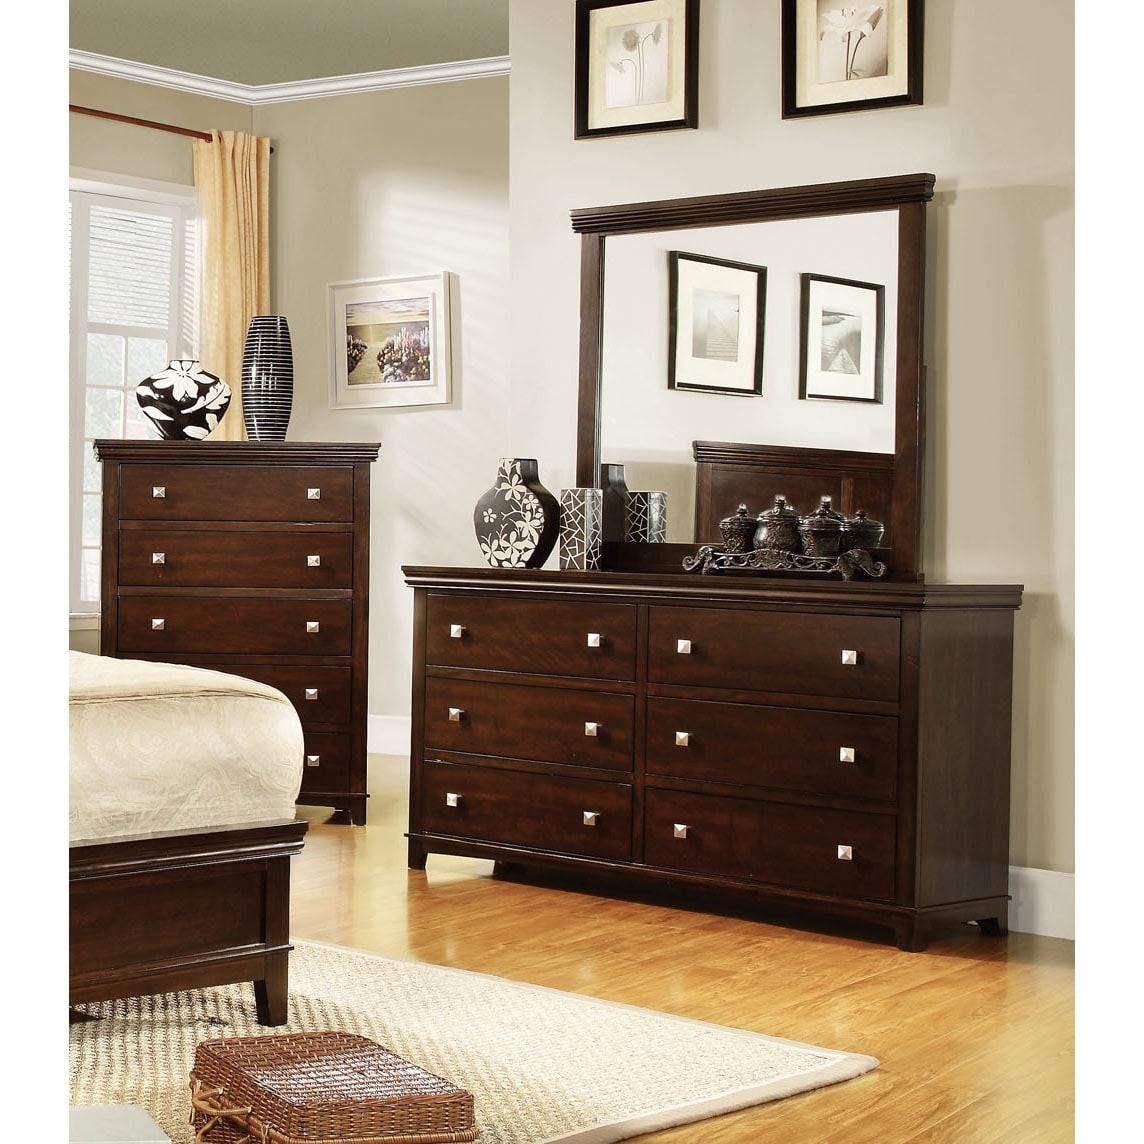 Furniture Of America Tranzio Natural 2 Piece Dresser And Mirror Set